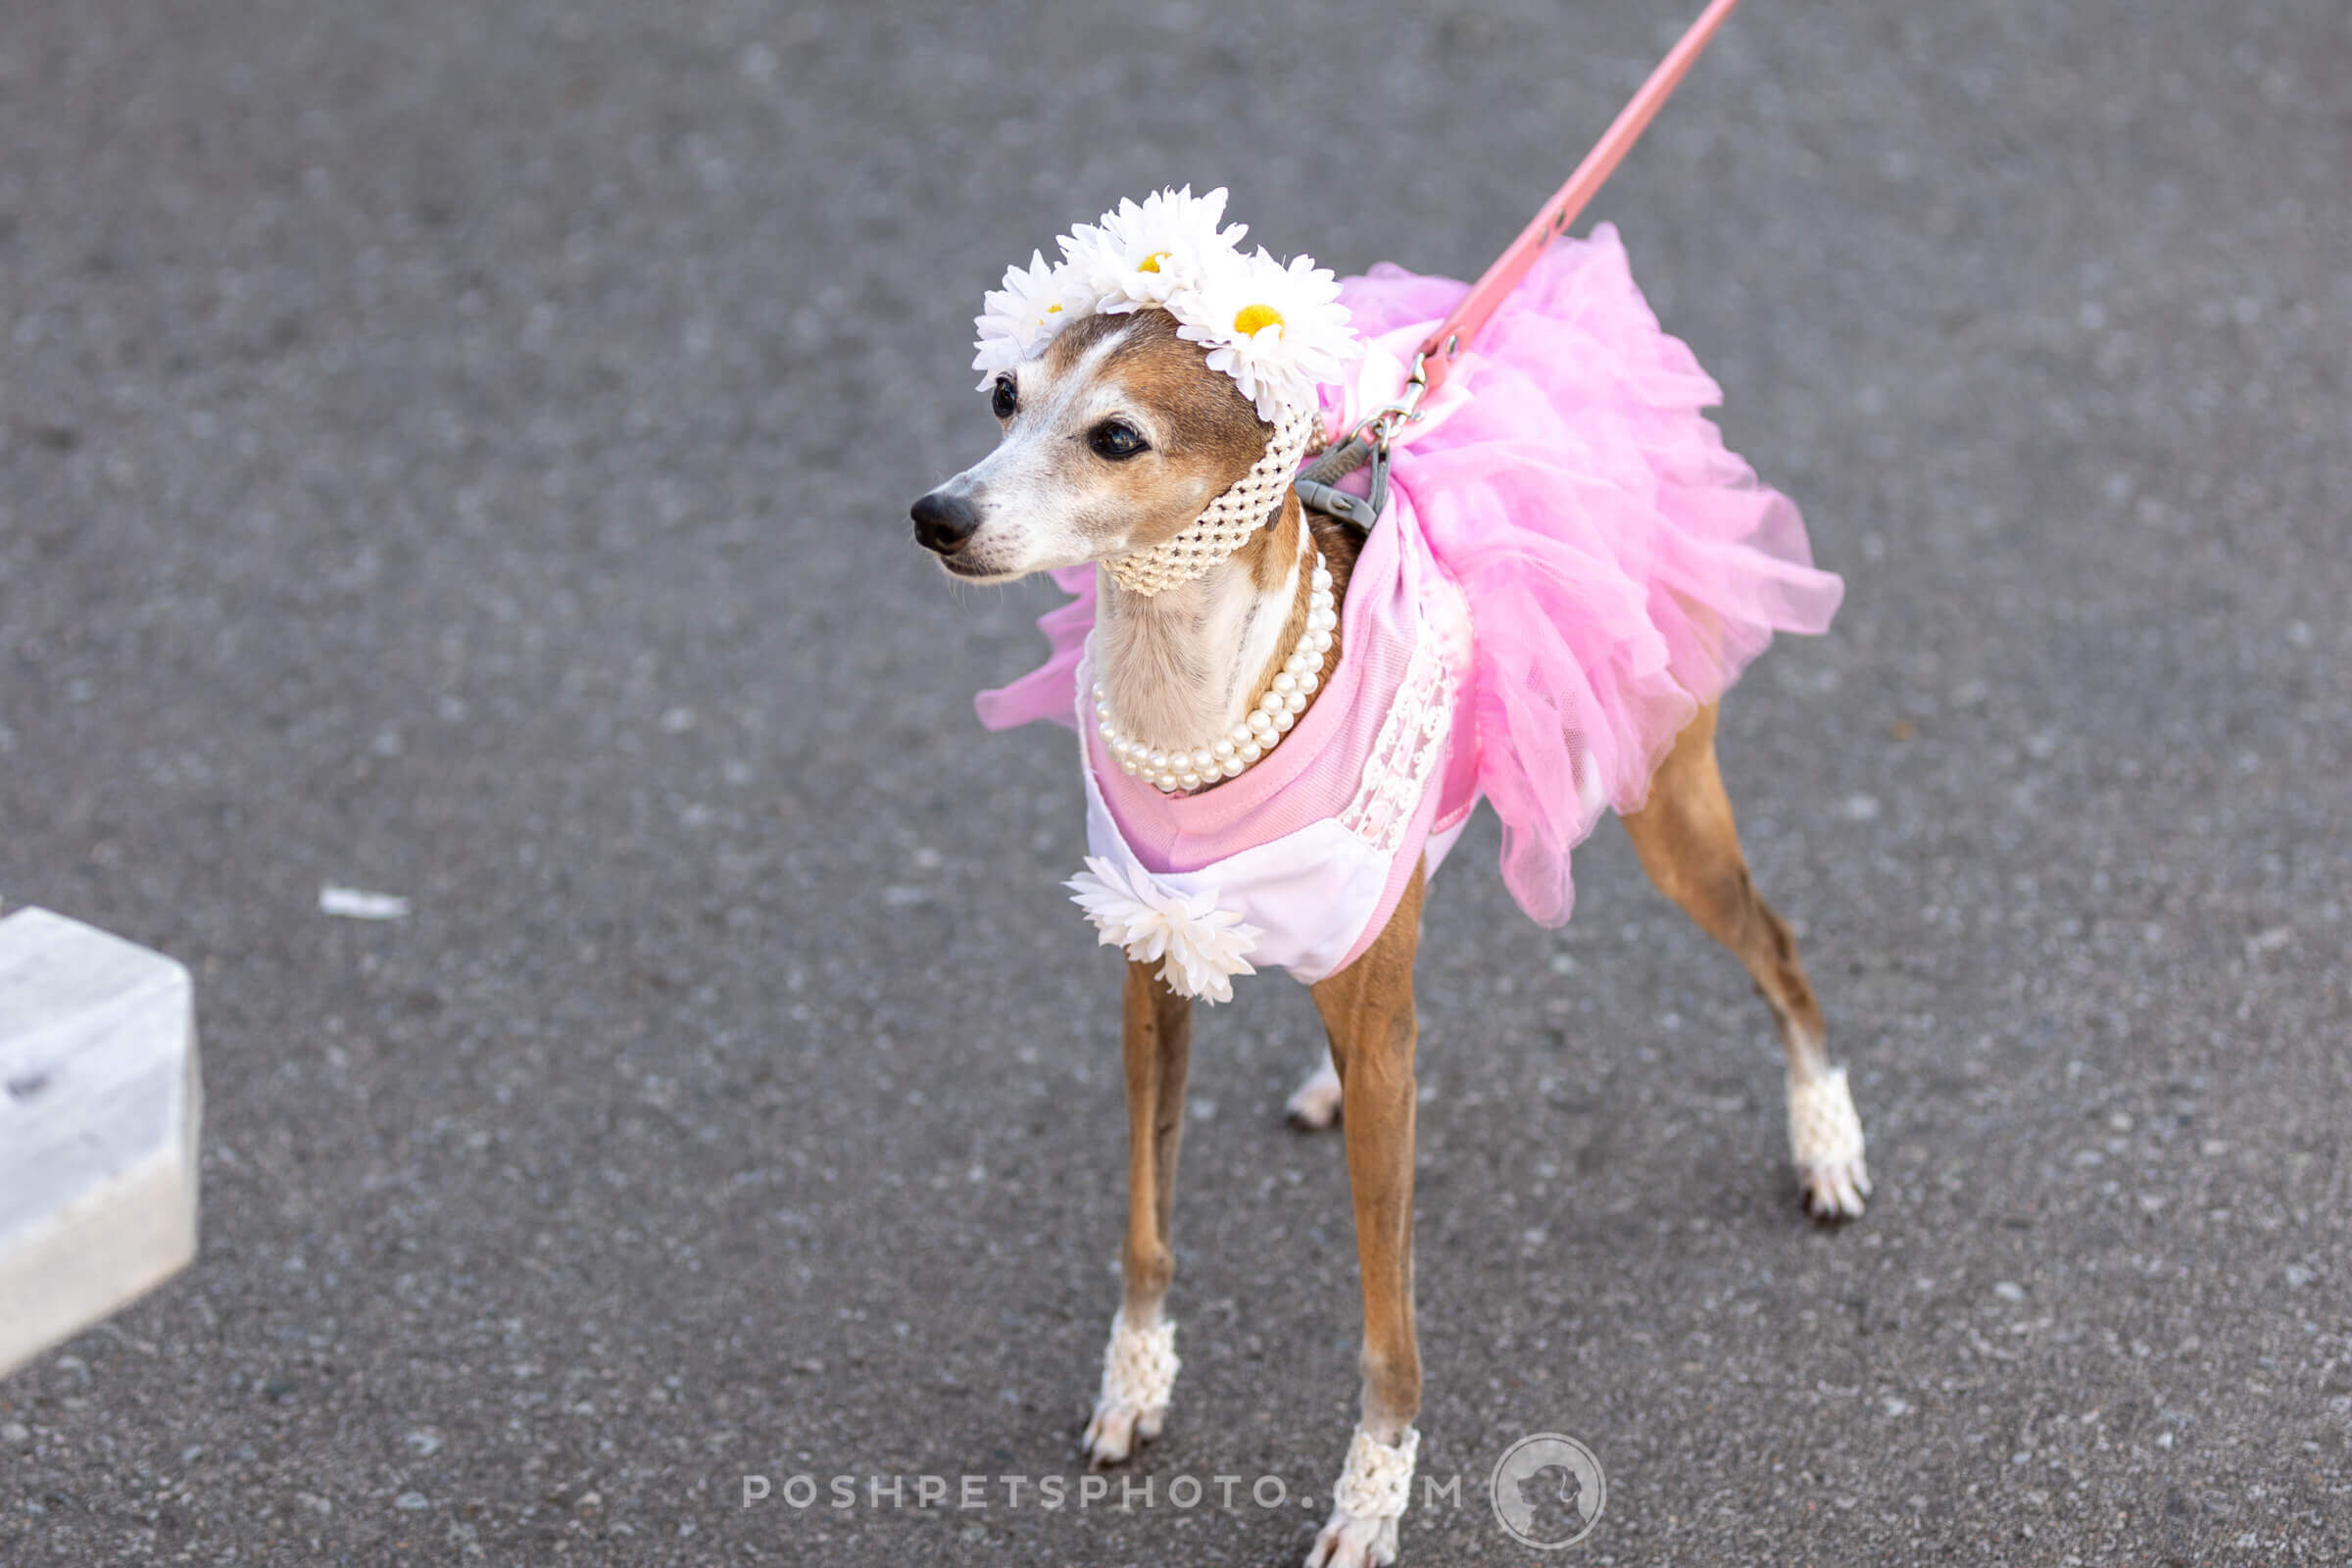 posh-pets-photography-18